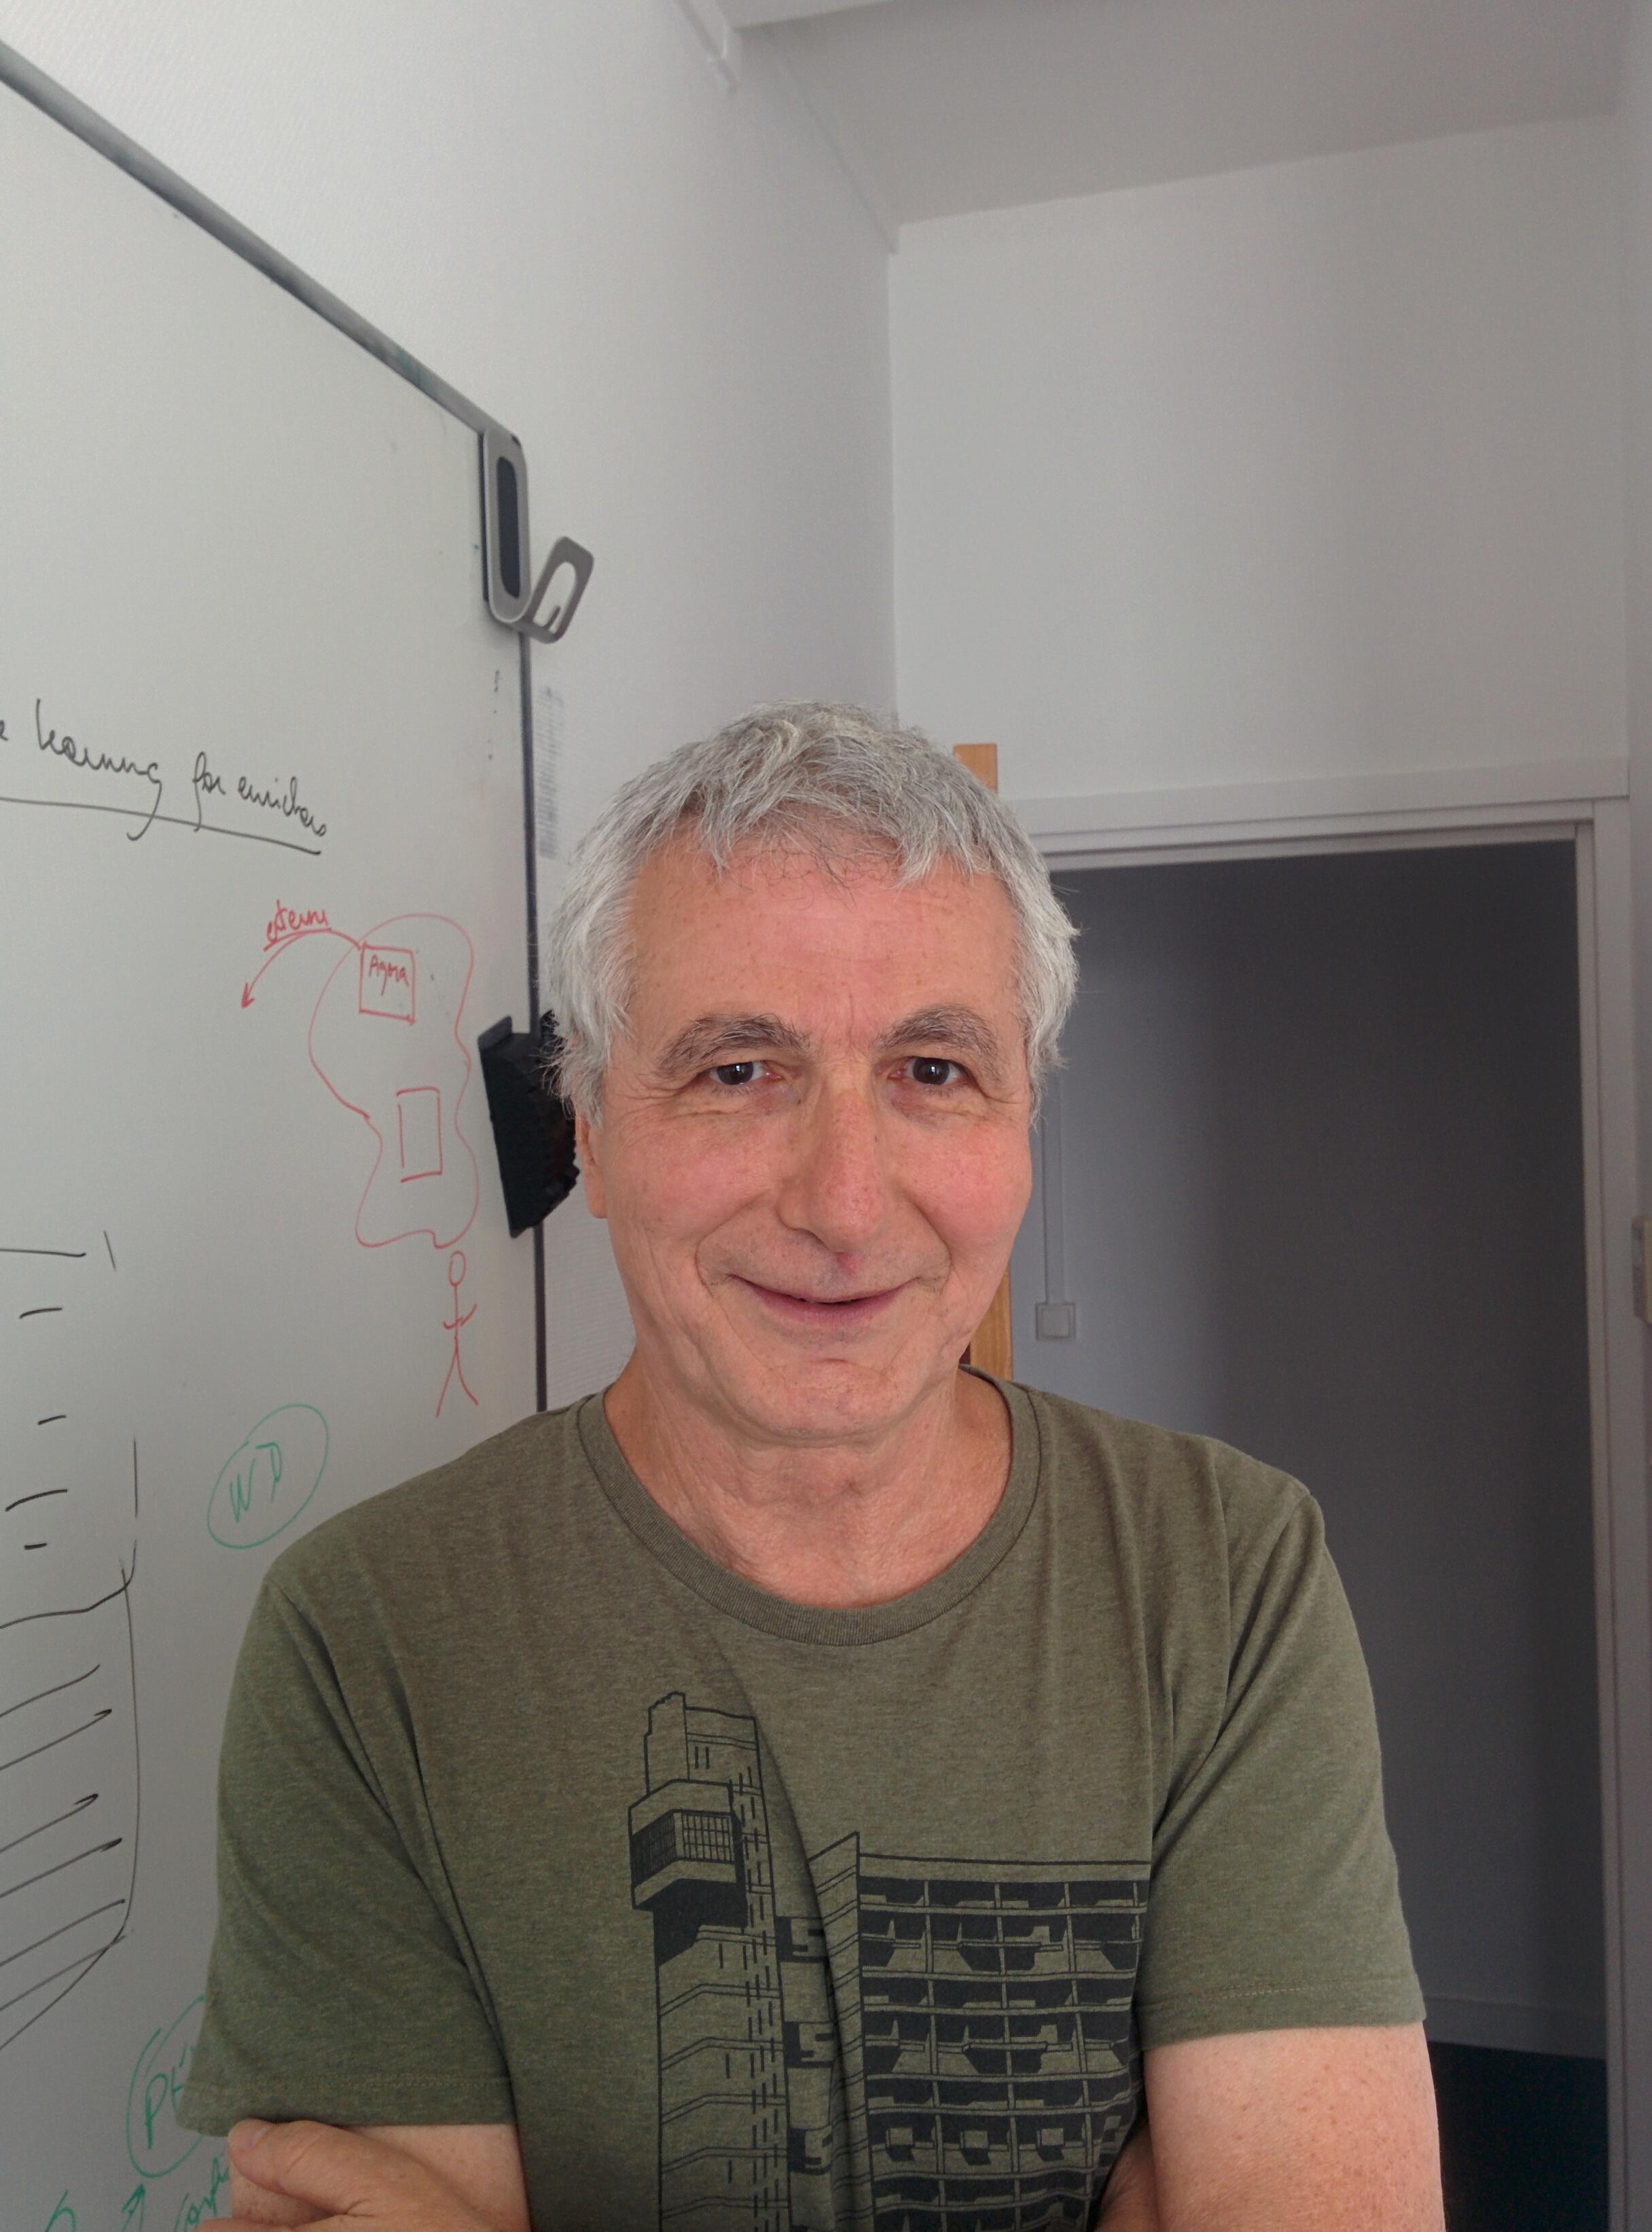 Serge Abiteboul in 2016